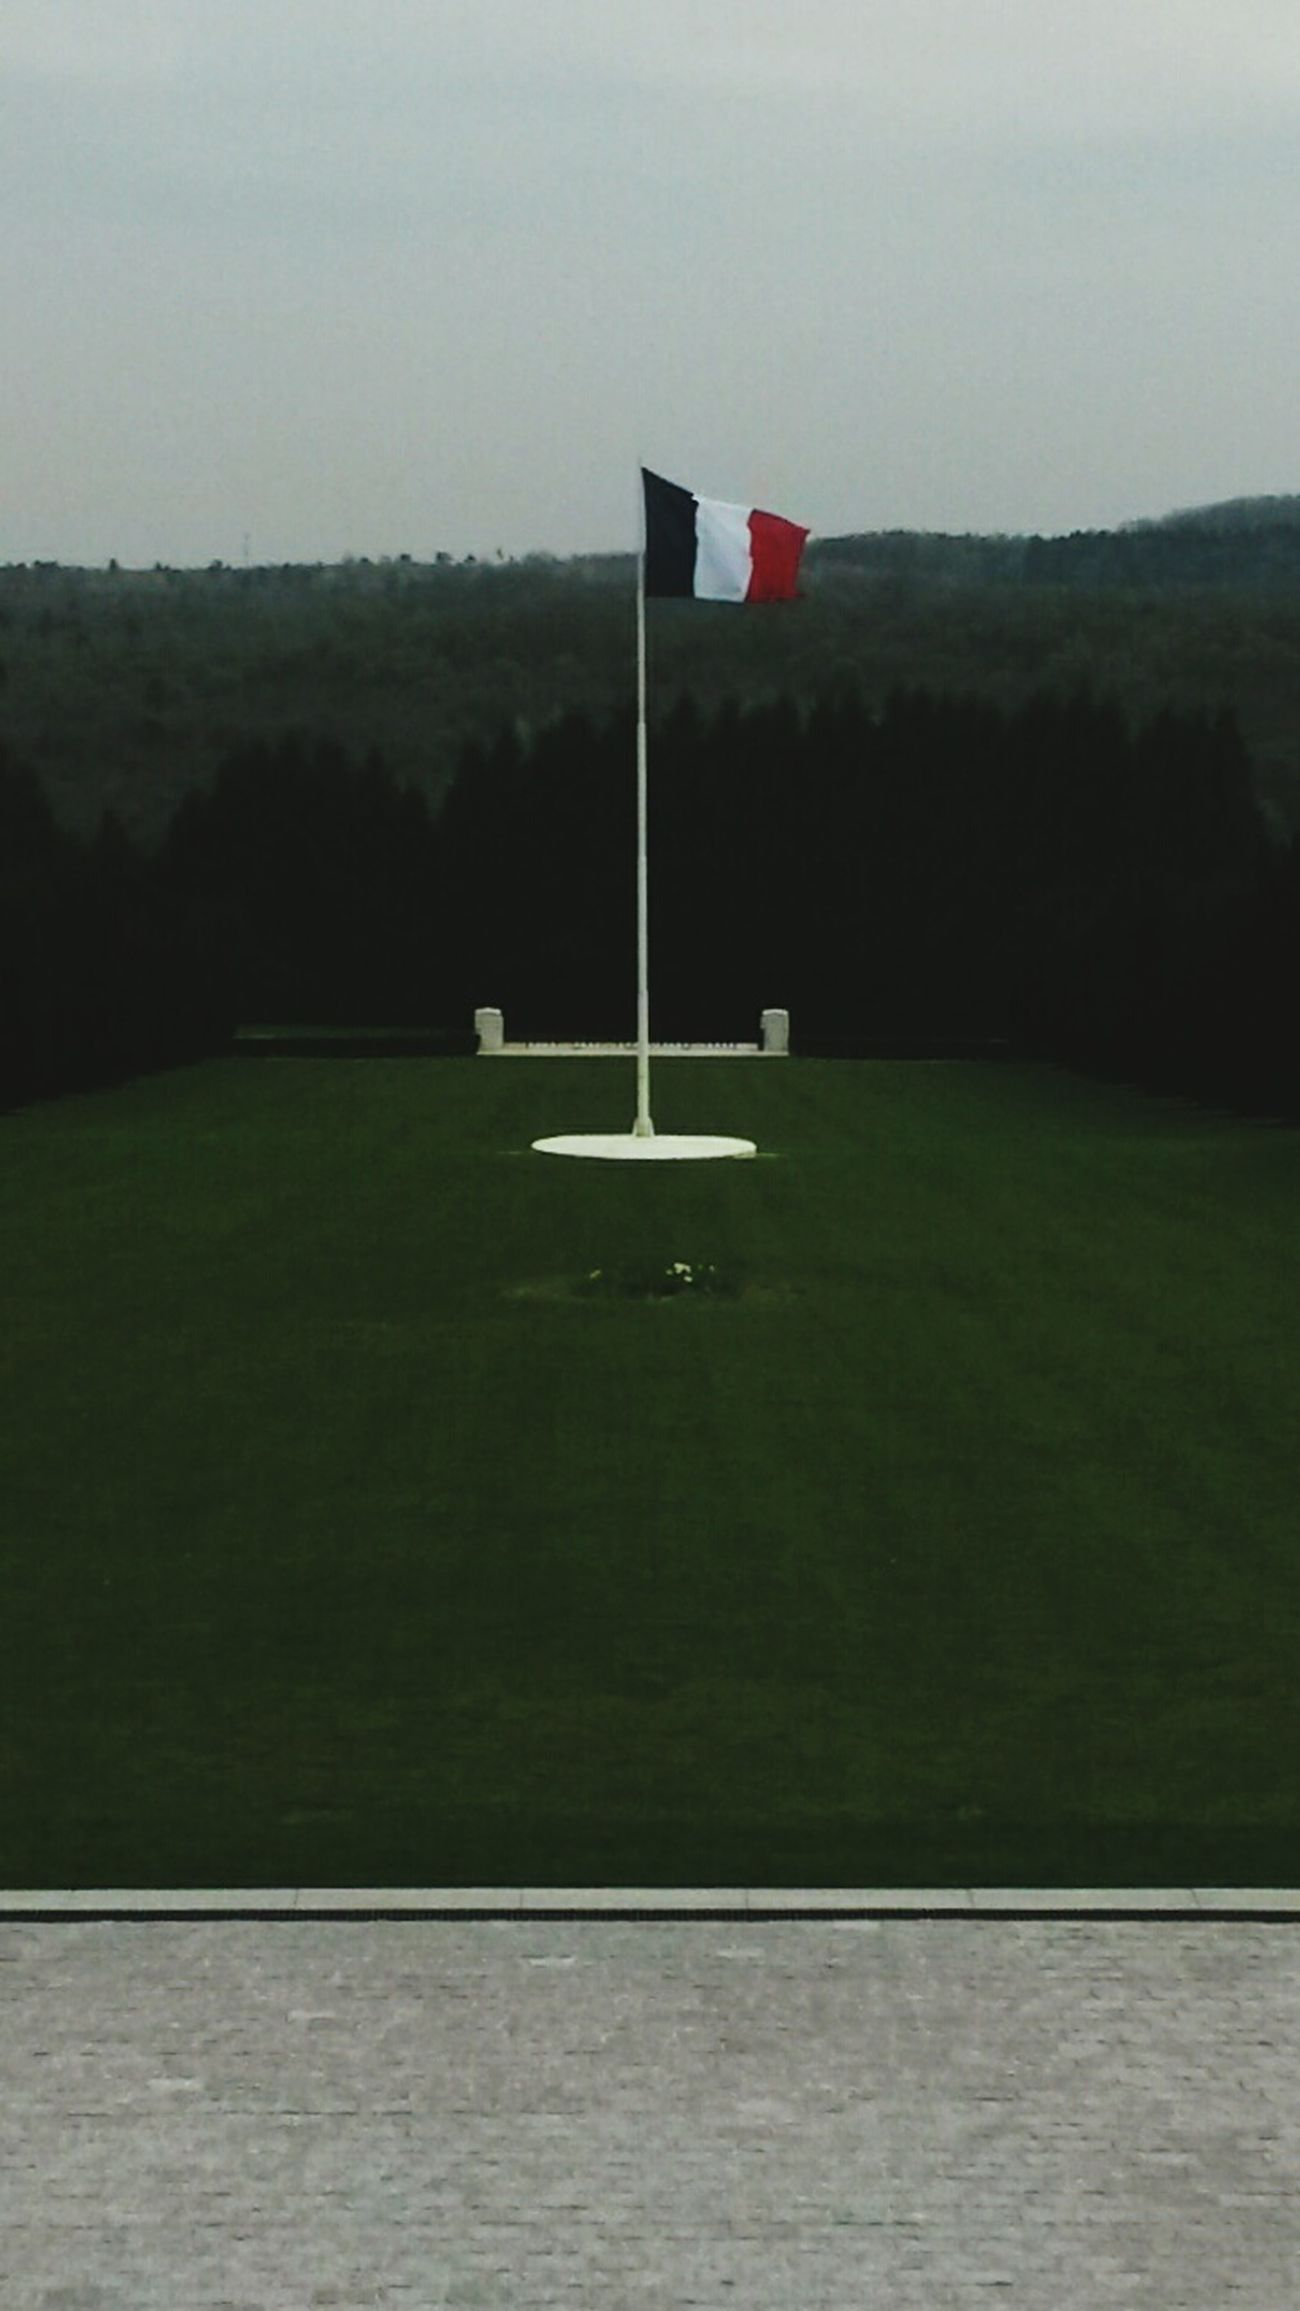 Introduction: My trip to Verdun 1916 1/3 Trip Verdun World War 1 Memorial France Enjoying The View French Flag